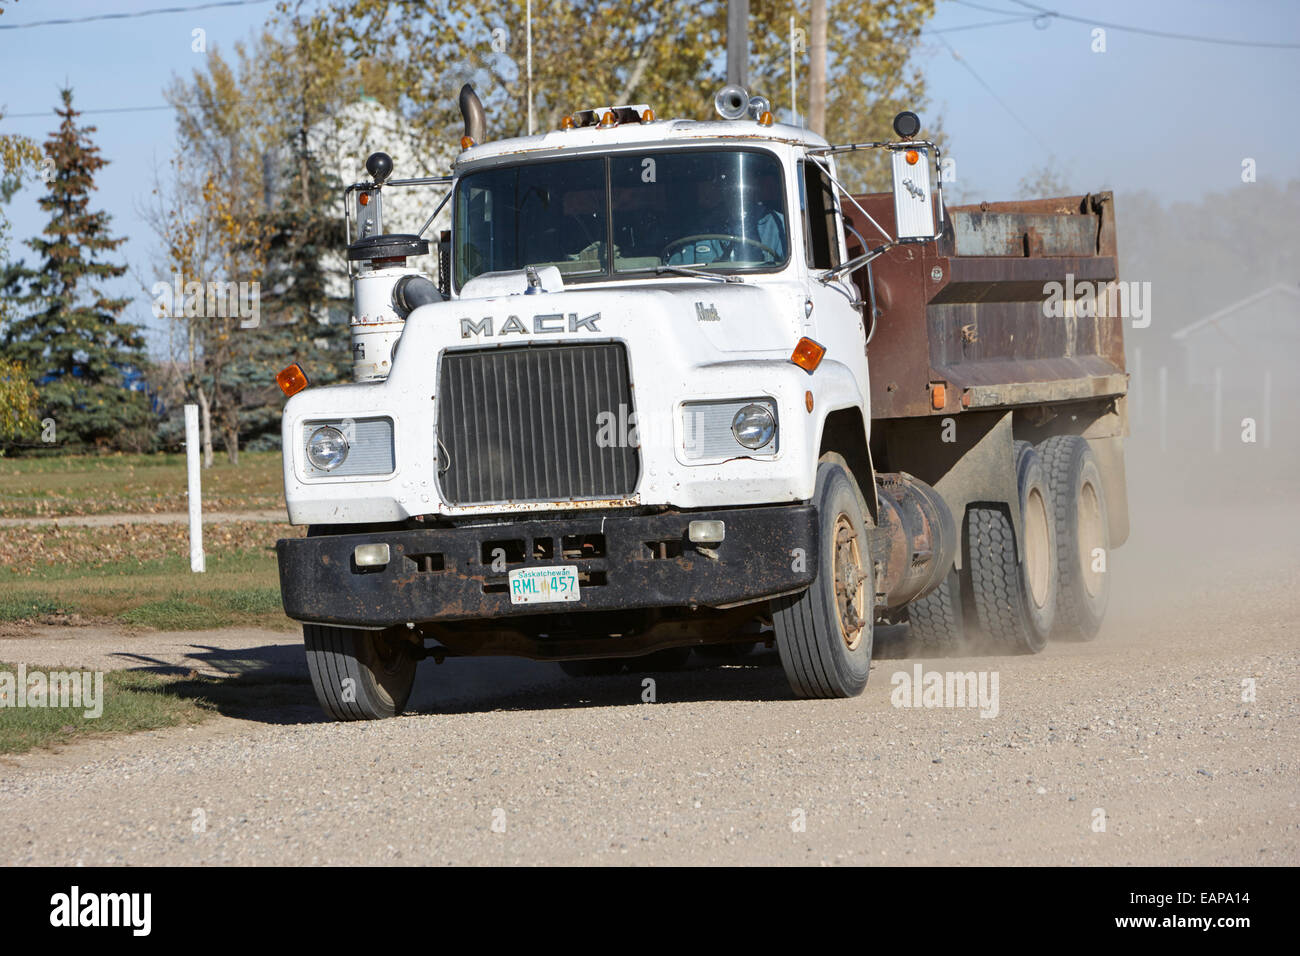 mack truck driving down rough unpaved rural road in farming community Saskatchewan Canada - Stock Image